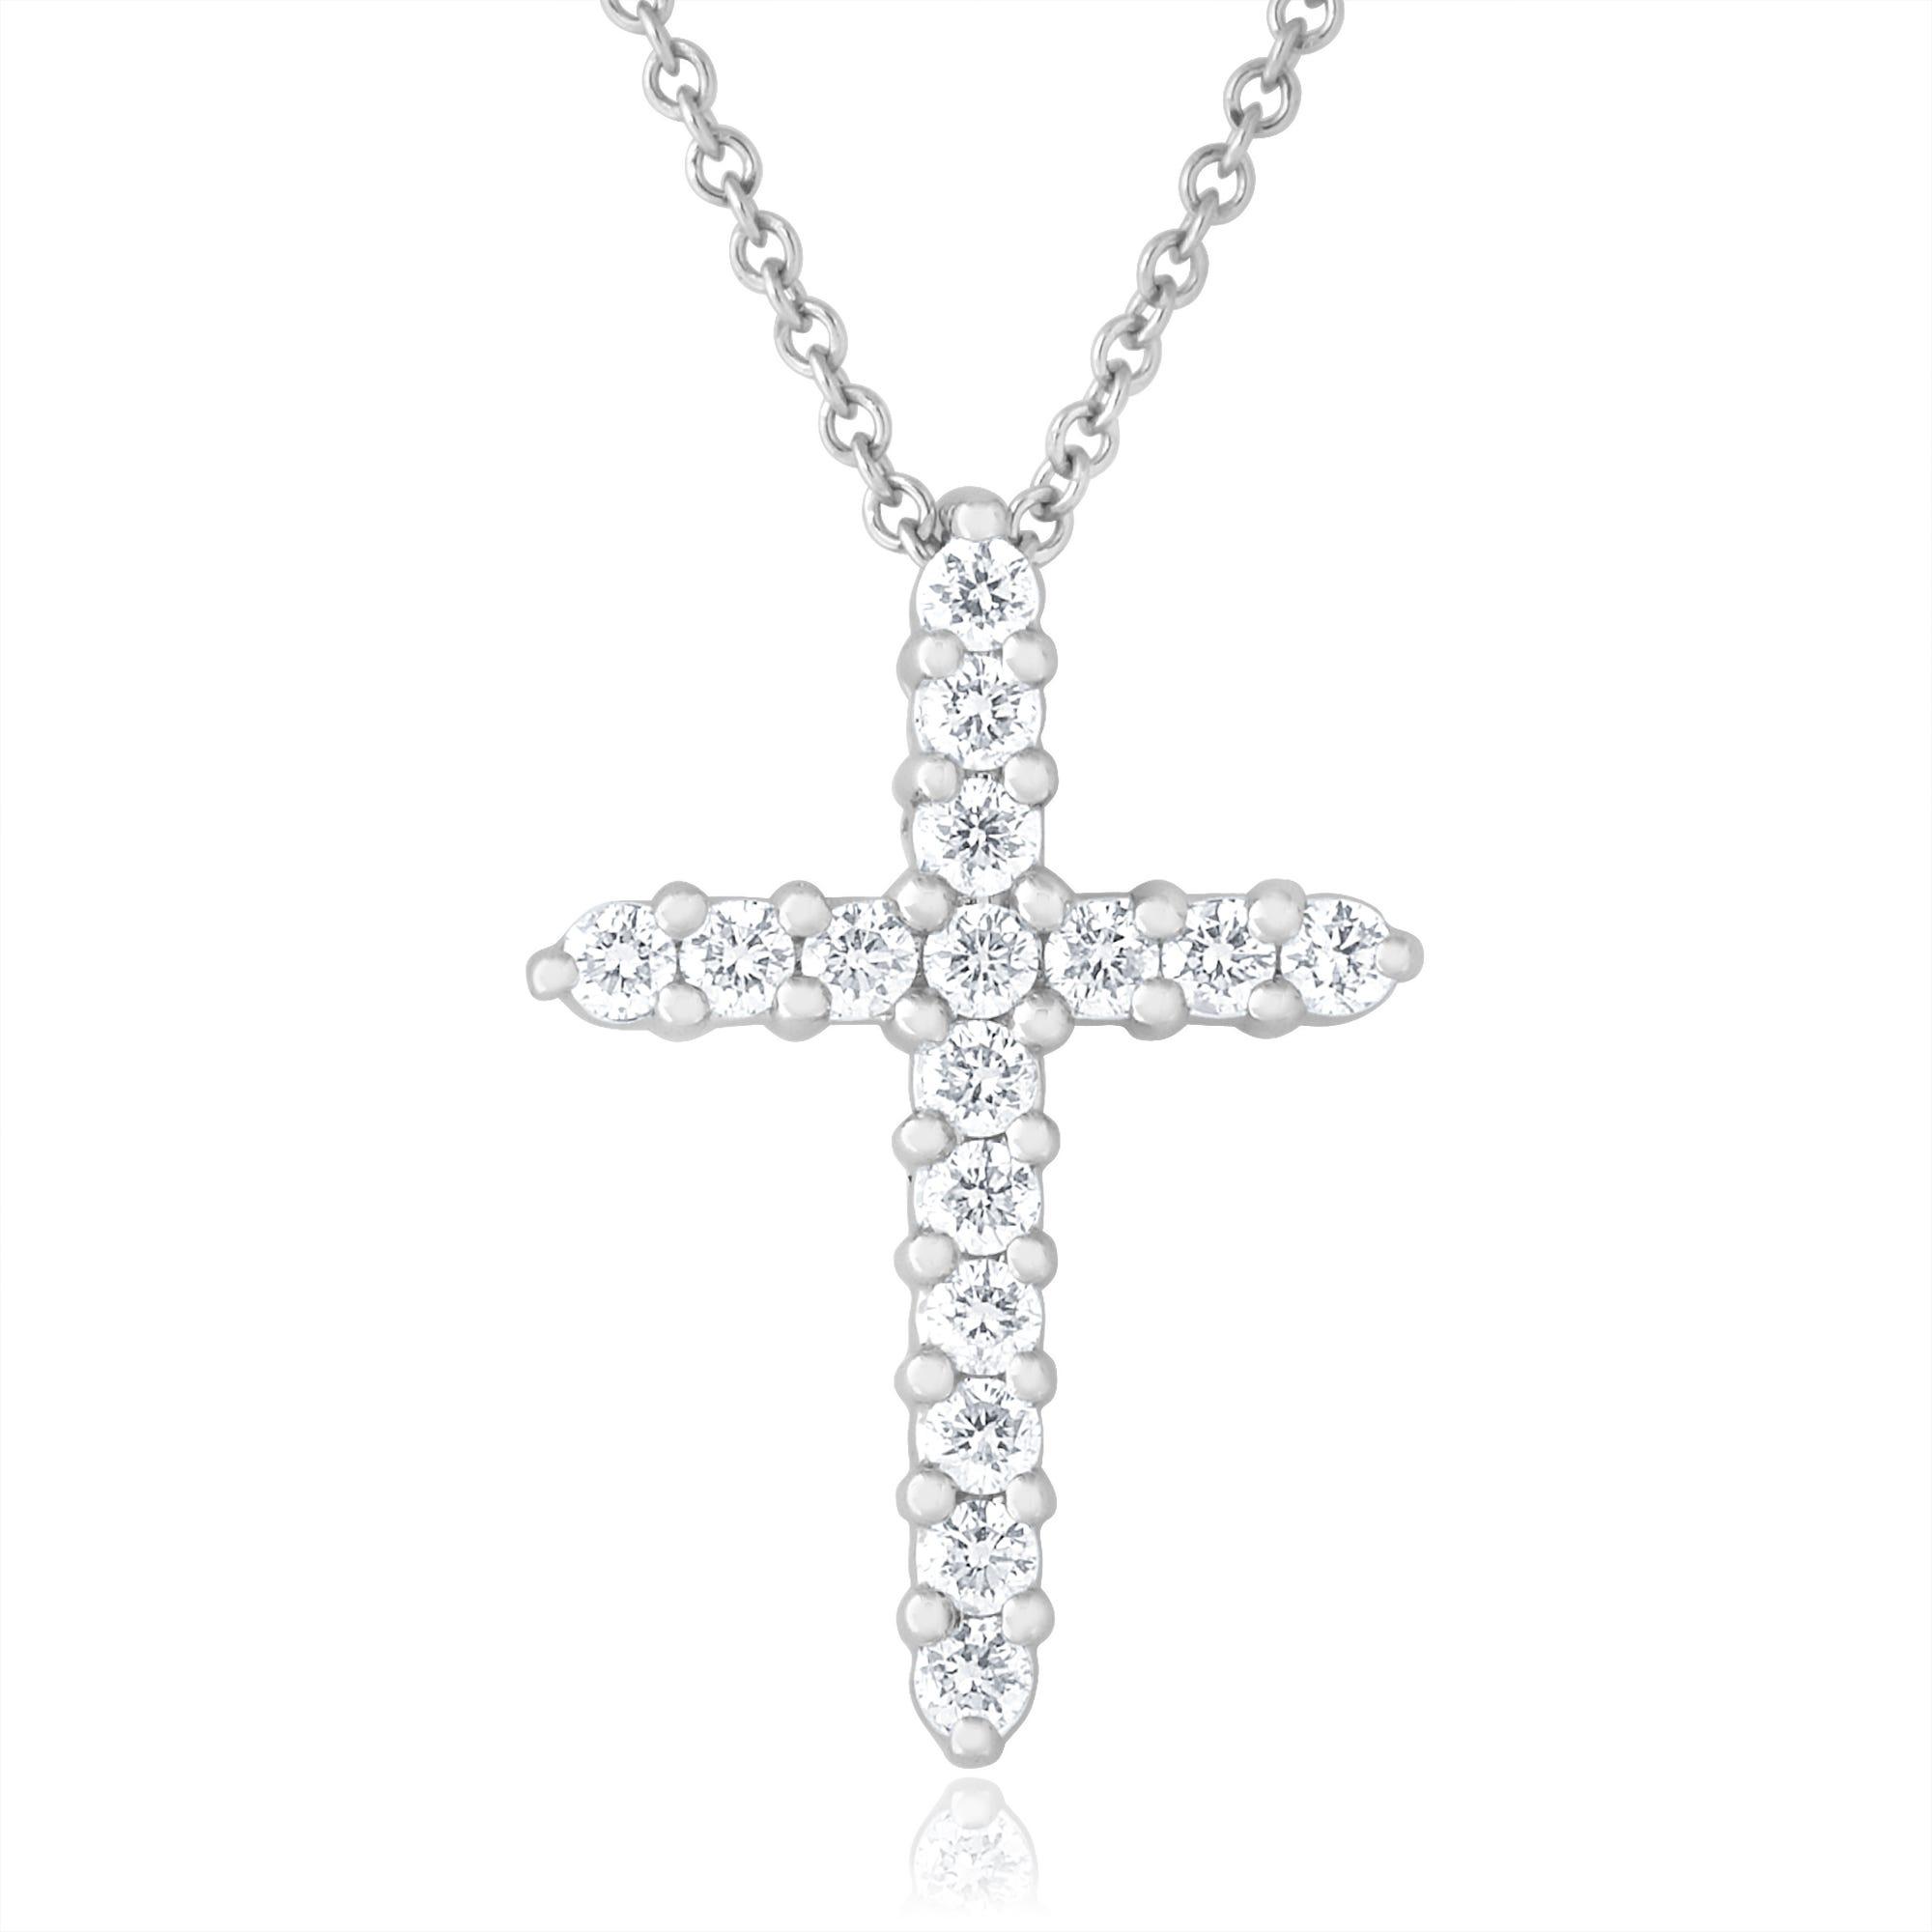 Diamond Cross Pendant 1/4ctw in 14k White Gold